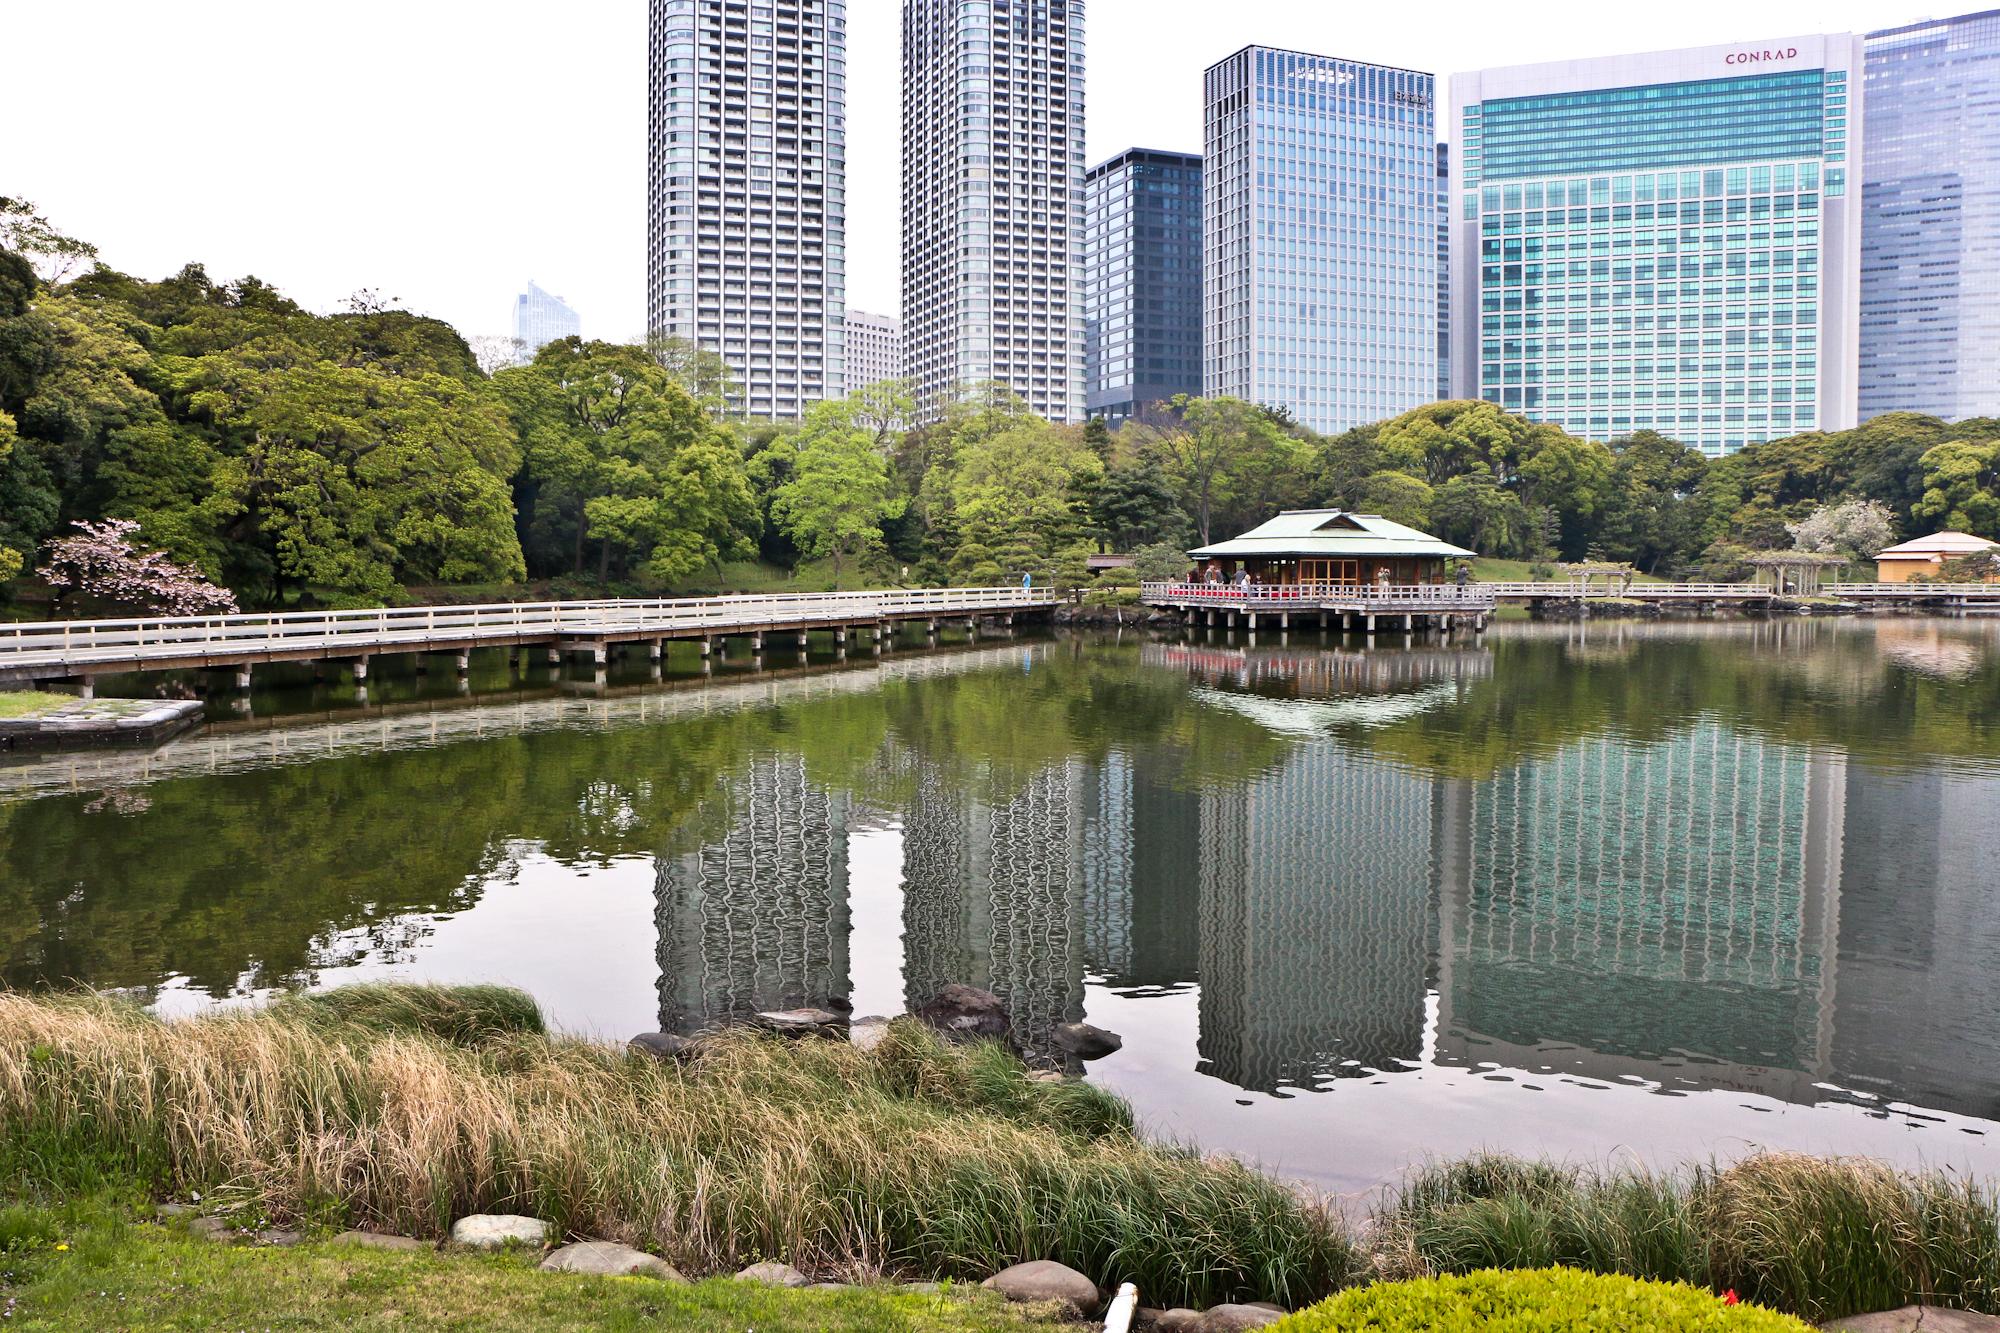 Tokyo Scene . Hama-rikyu Gardens, a former preserve of the Tokugawa Shoguns, backed by the high-rises of Shimbashi.